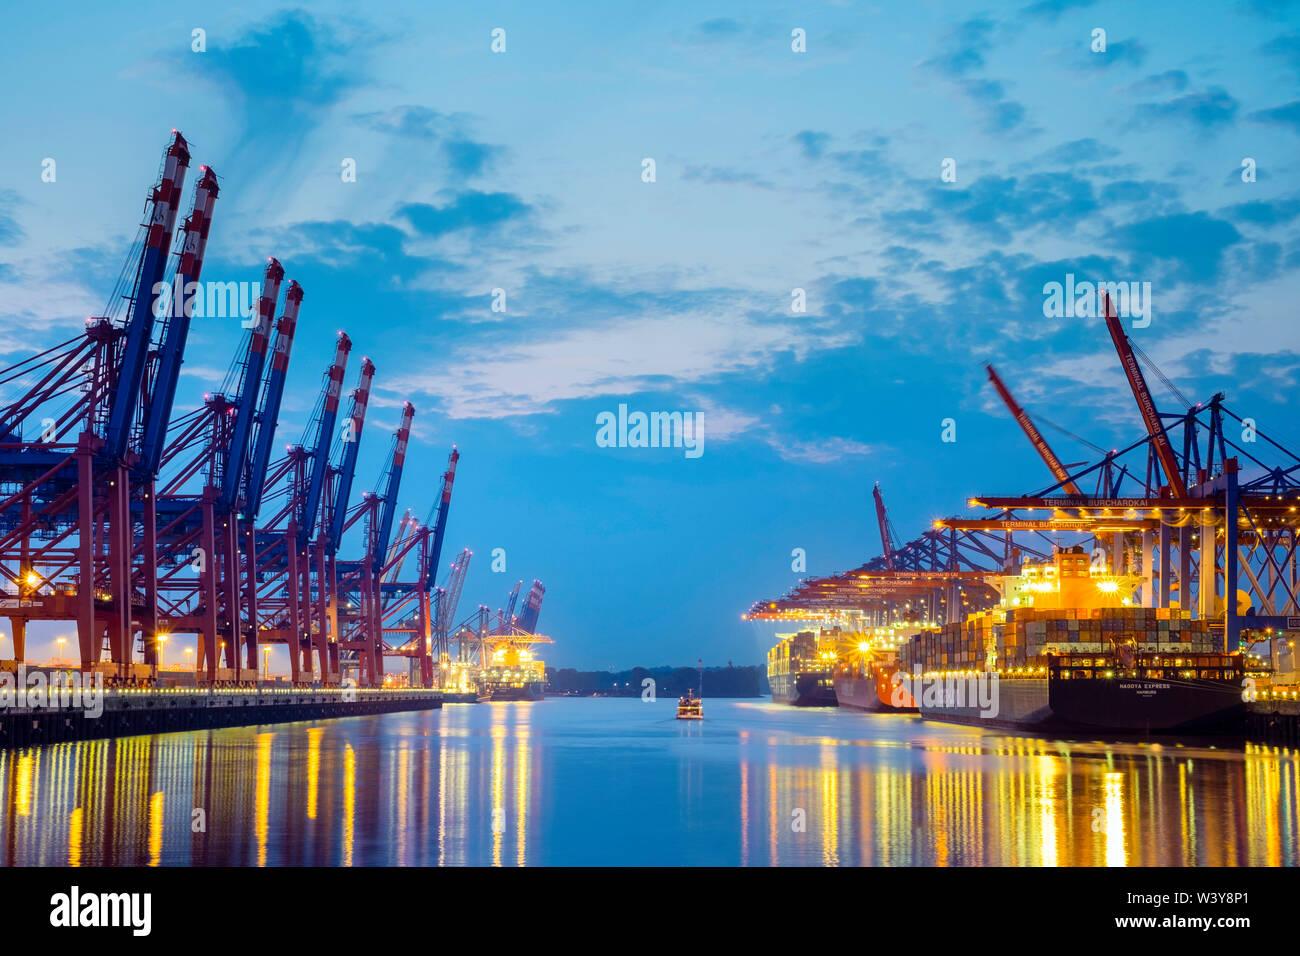 Cargo ships being loaded at Burchardkai in Hamburg Harbor at night, Waltershofer Hafen, Hamburg, Germany Stock Photo